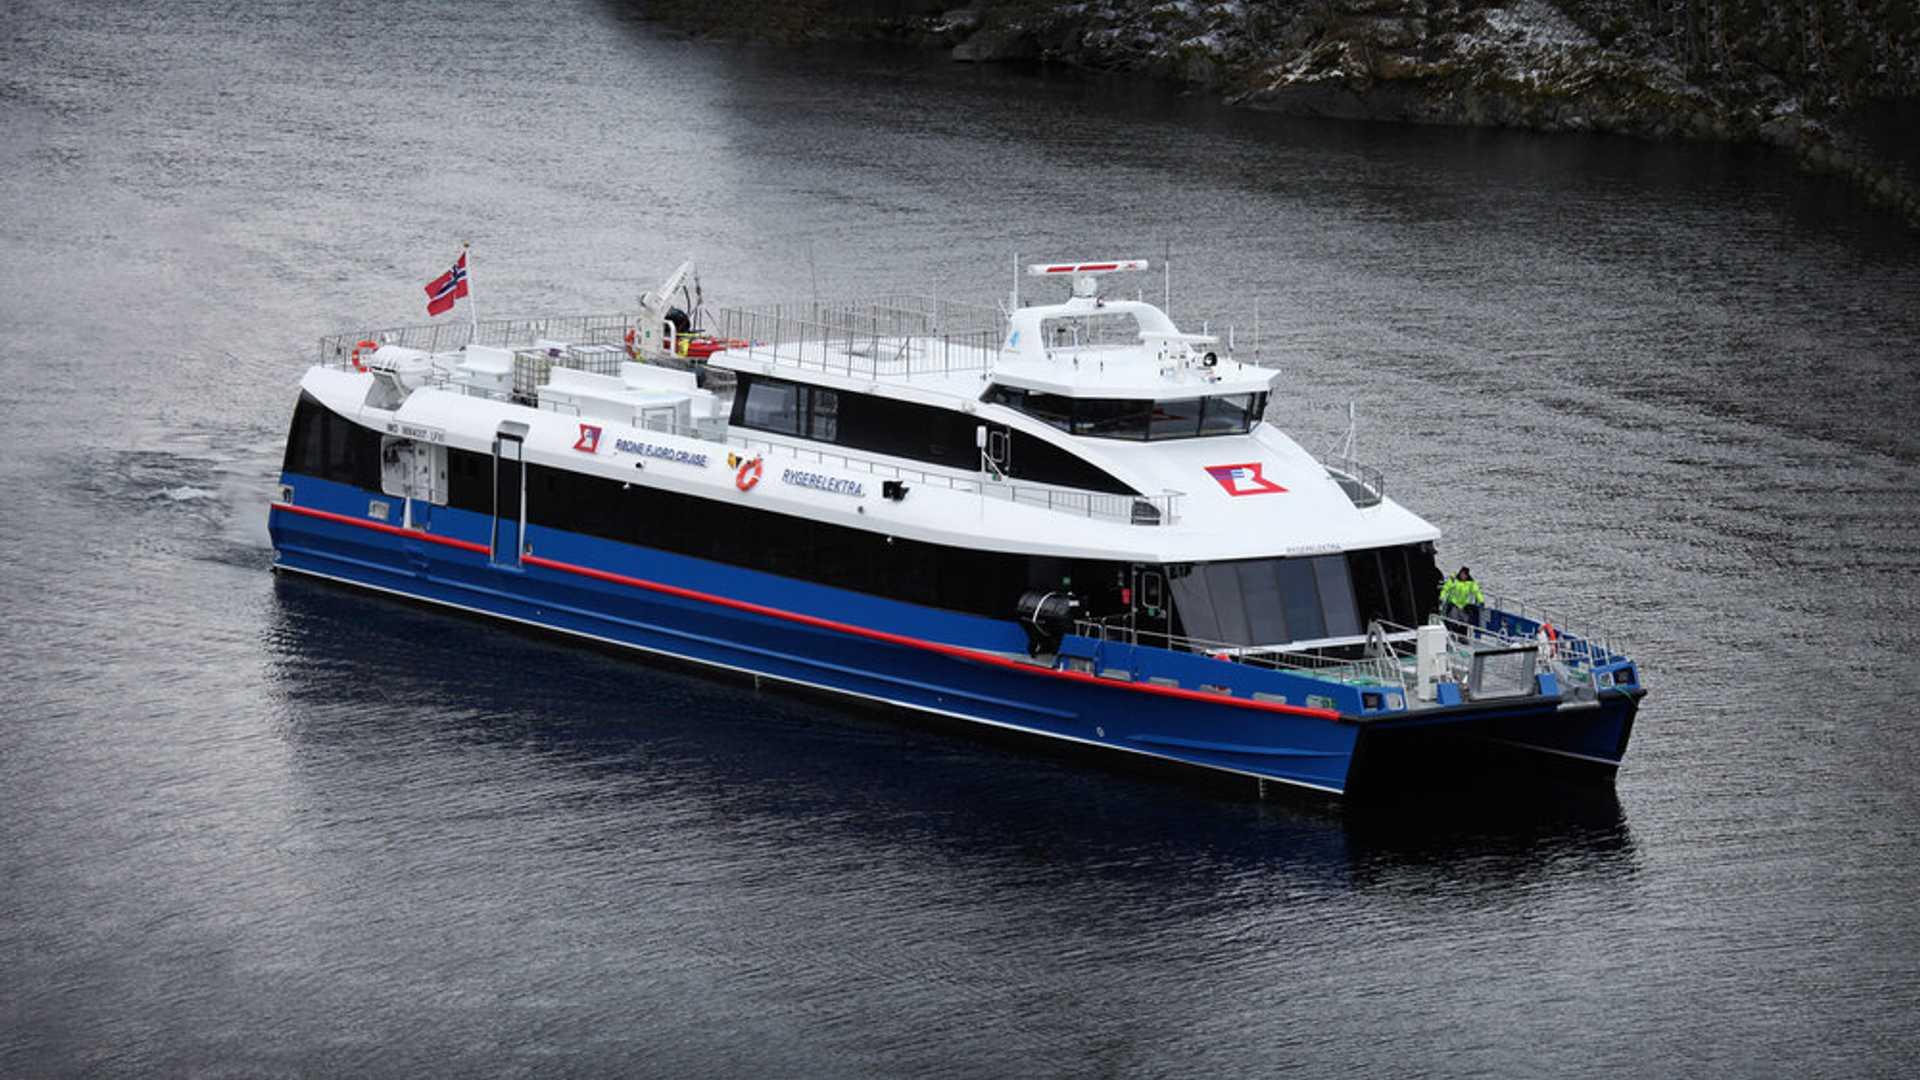 Rygerelektra all-electric ferry